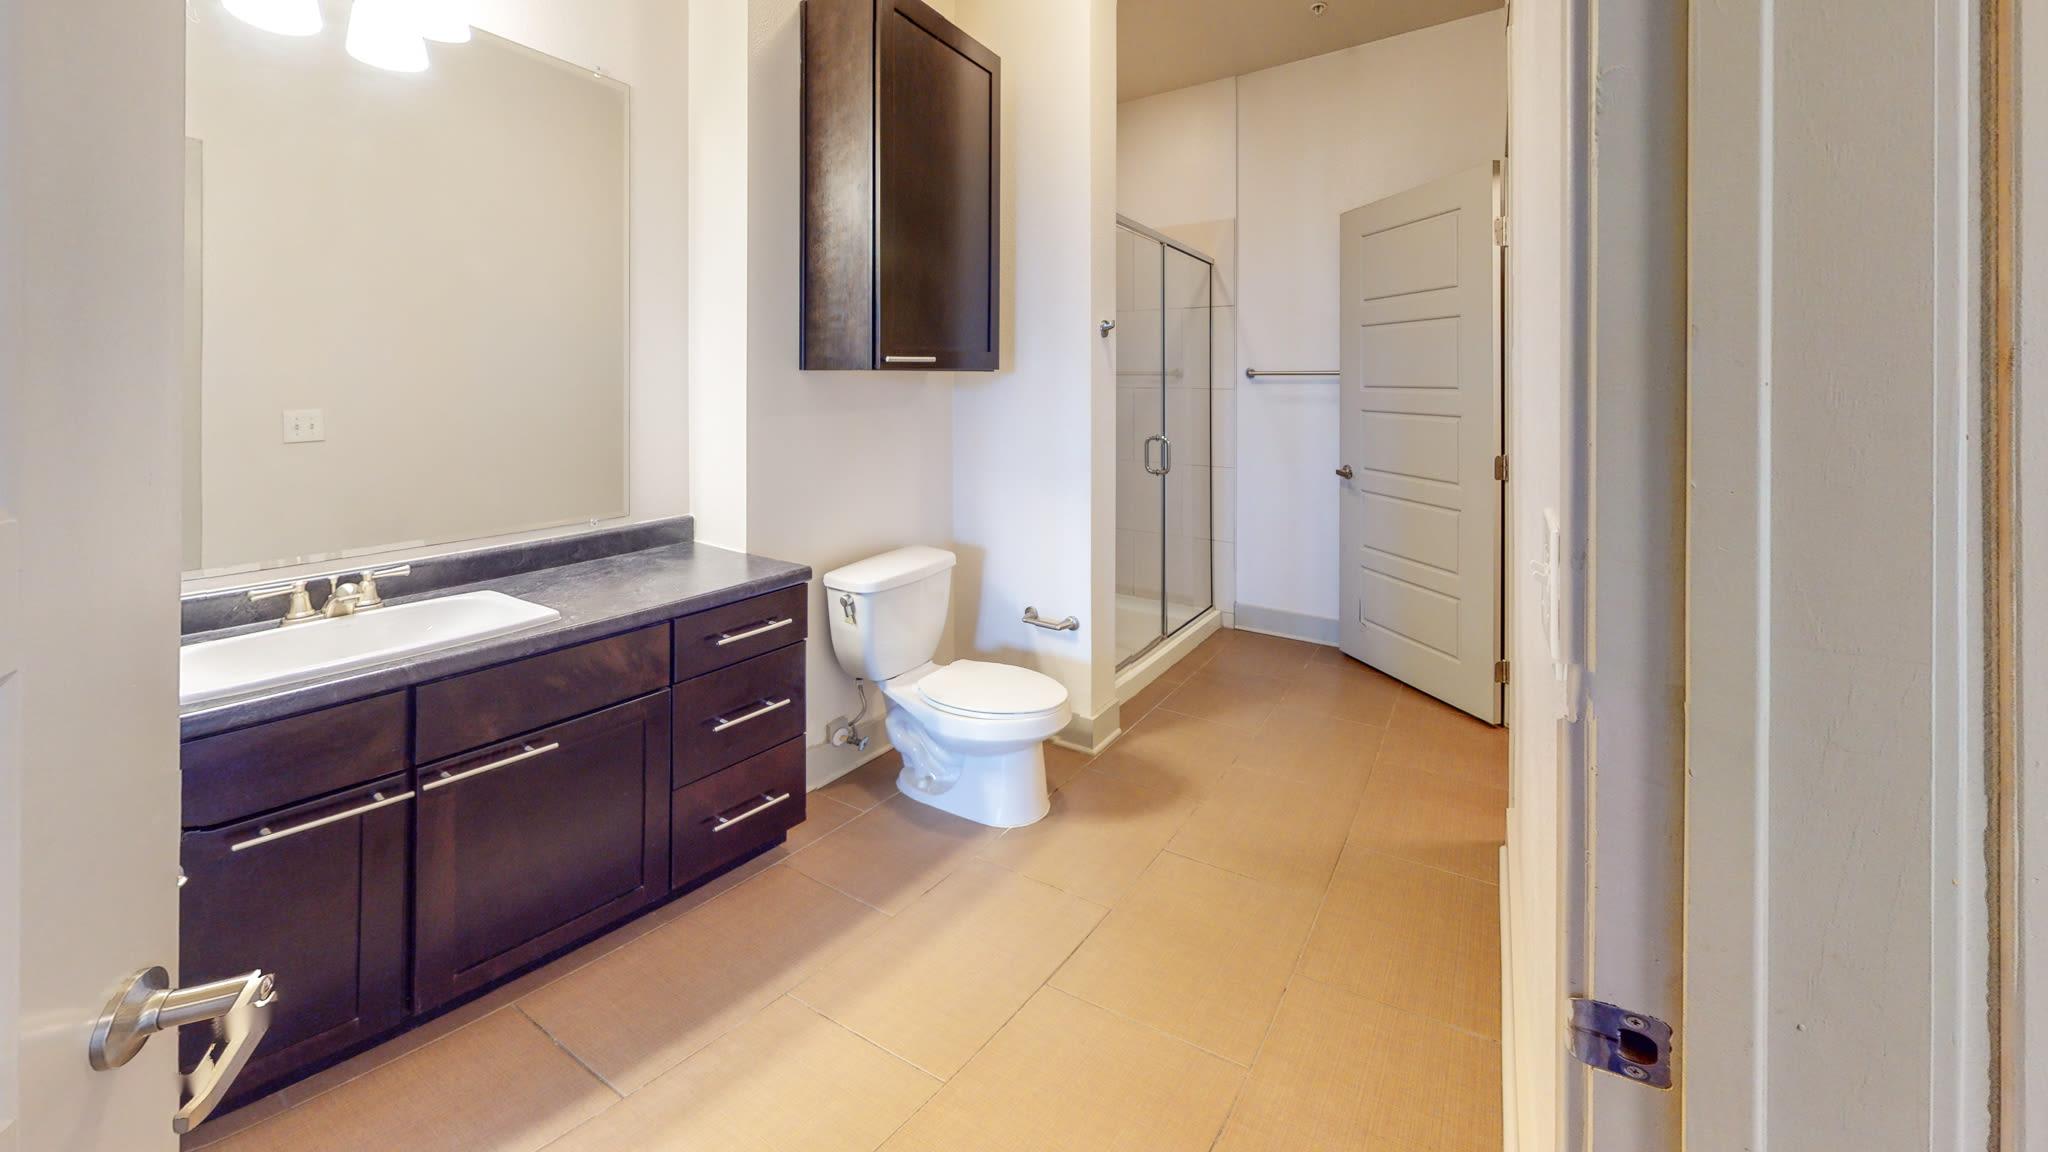 bathroom with dark finishes at Bellrock Bishop Arts in Dallas, Texas